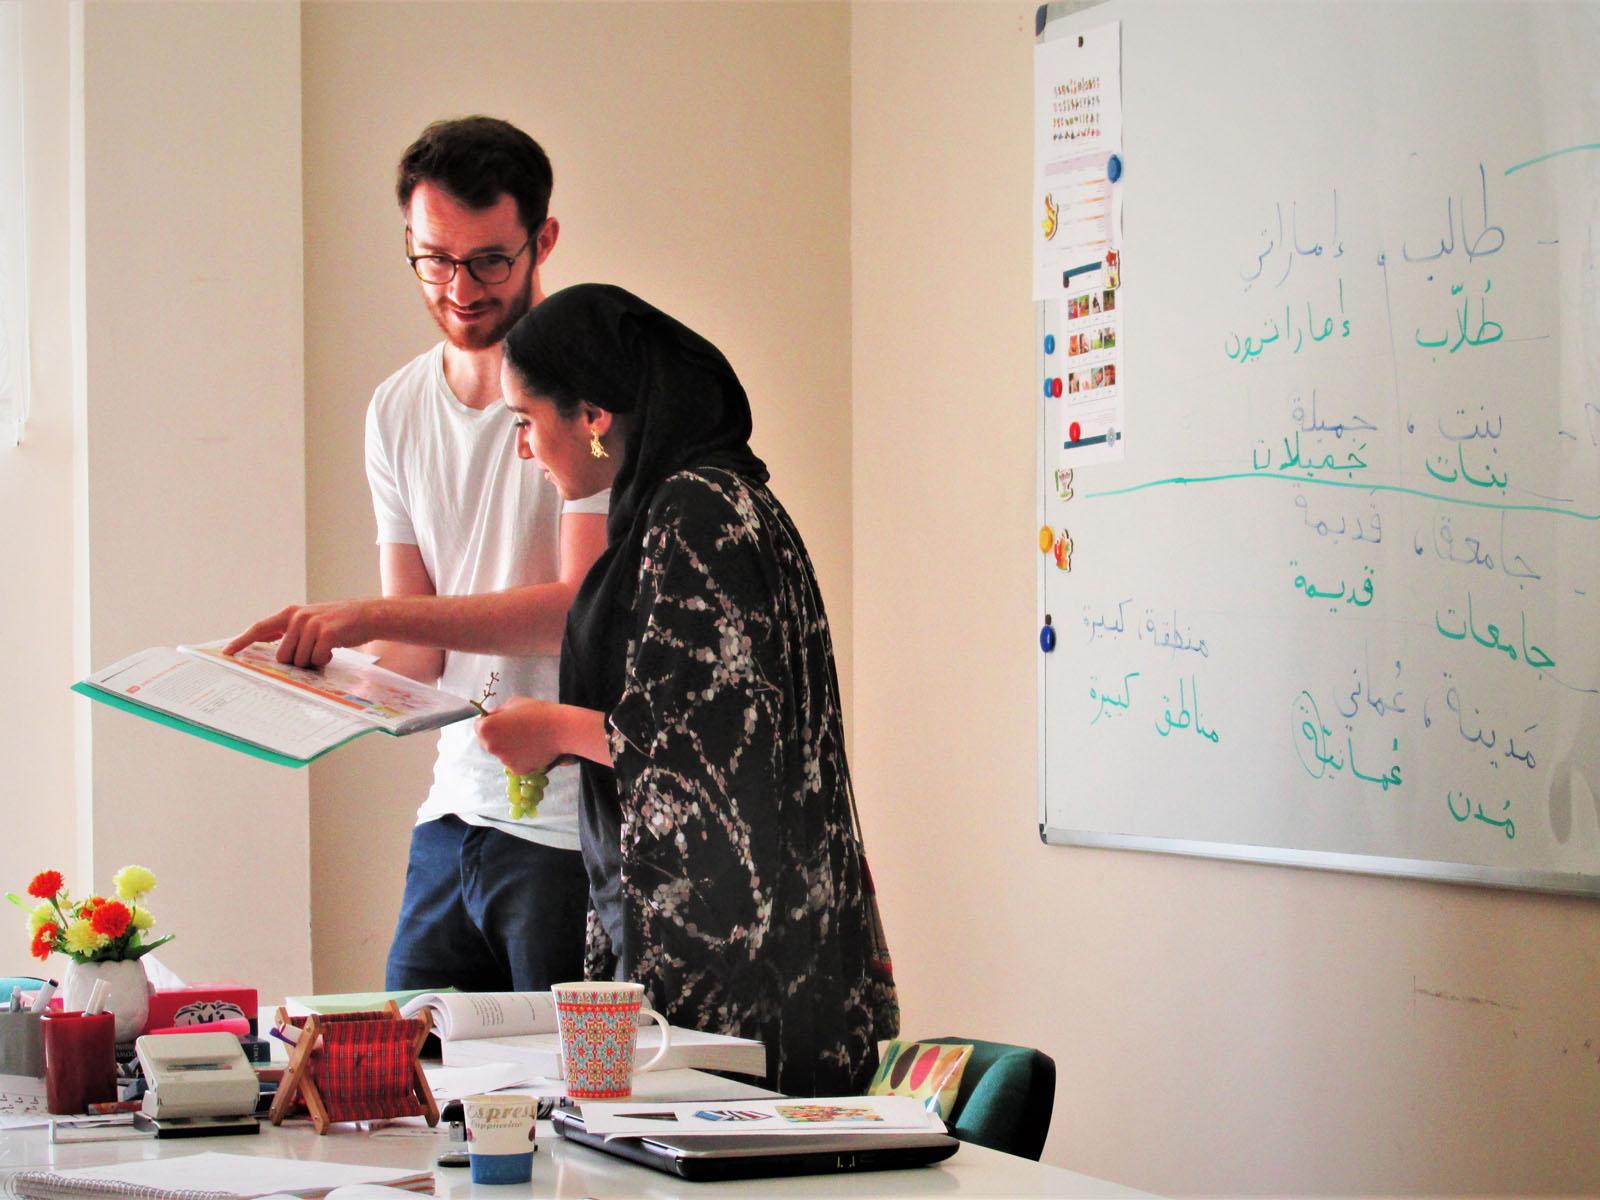 Картинки по запросу learn arabic in egypt